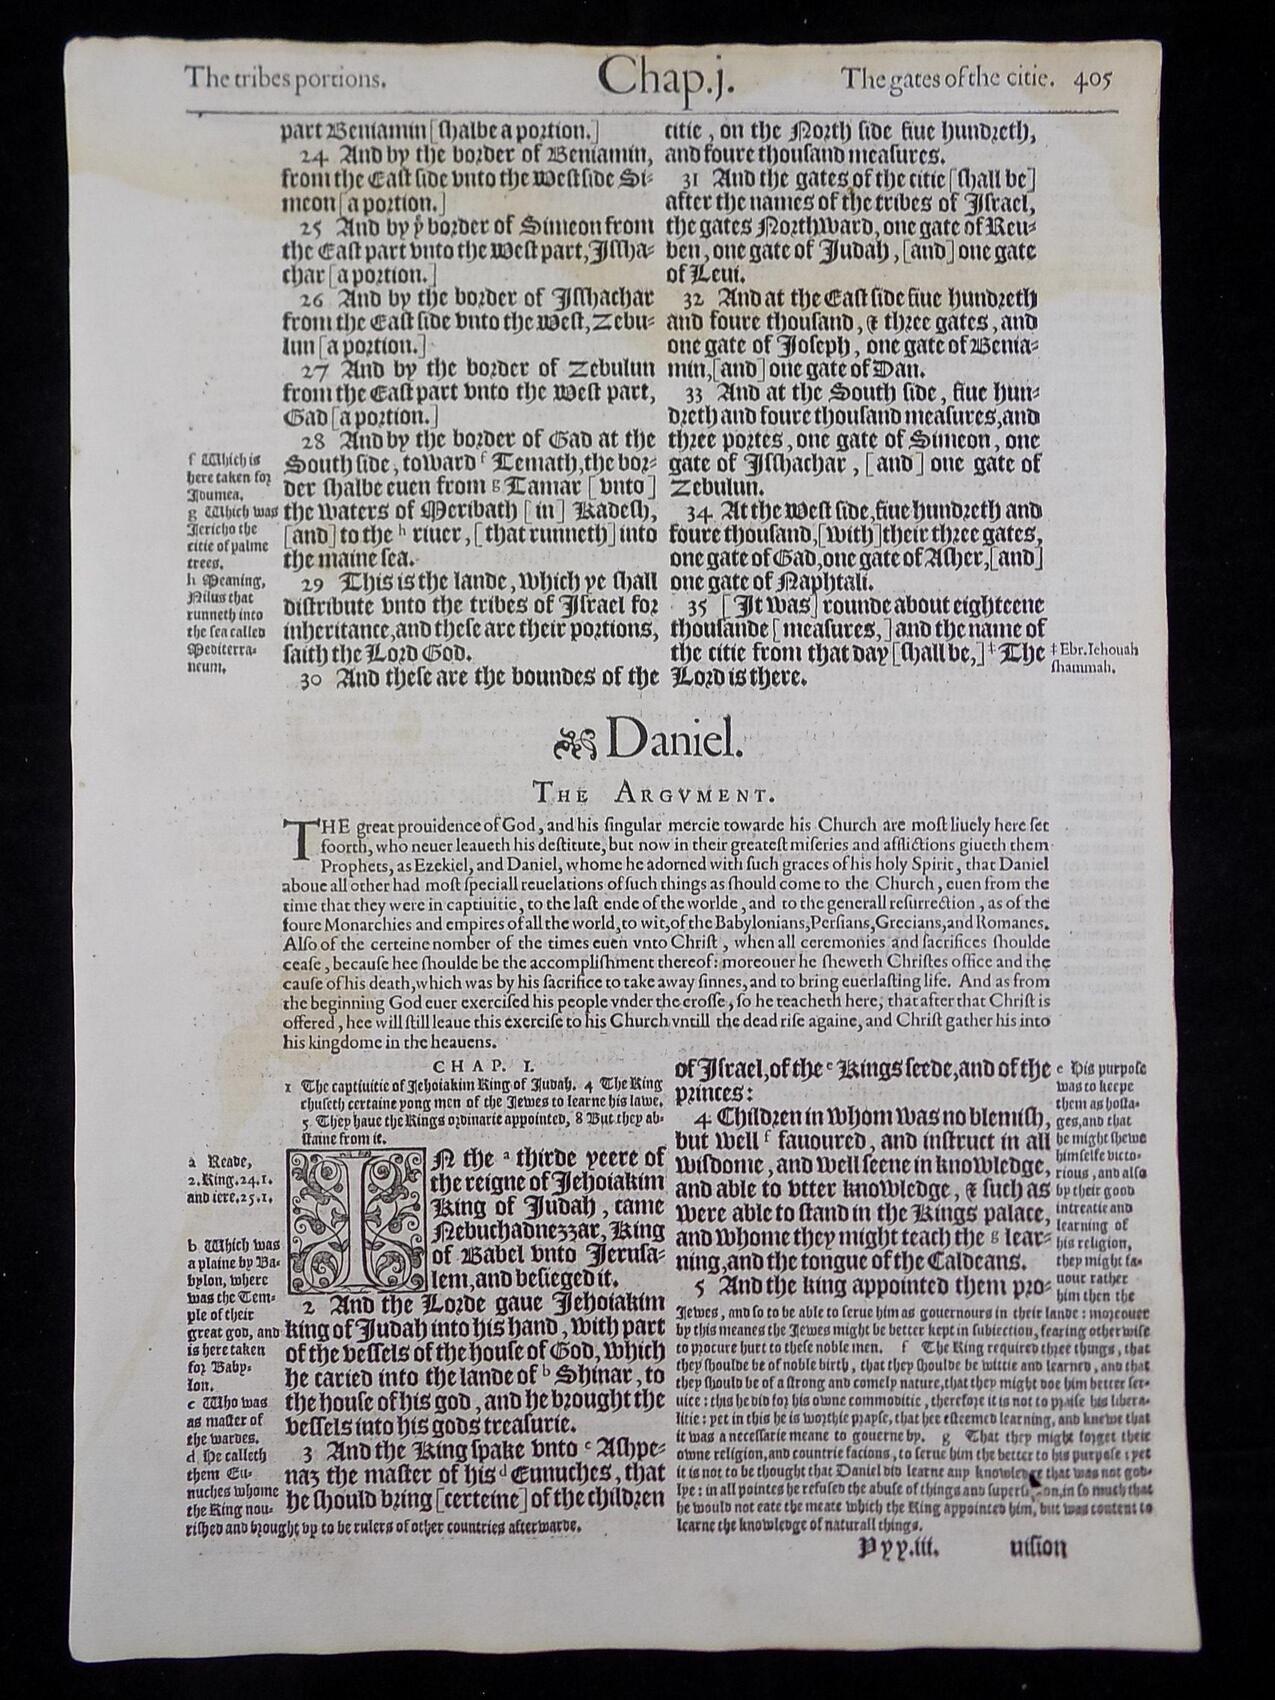 1583 NOBLEST GENEVA BIBLE LEAVES BOOK OF DANIEL